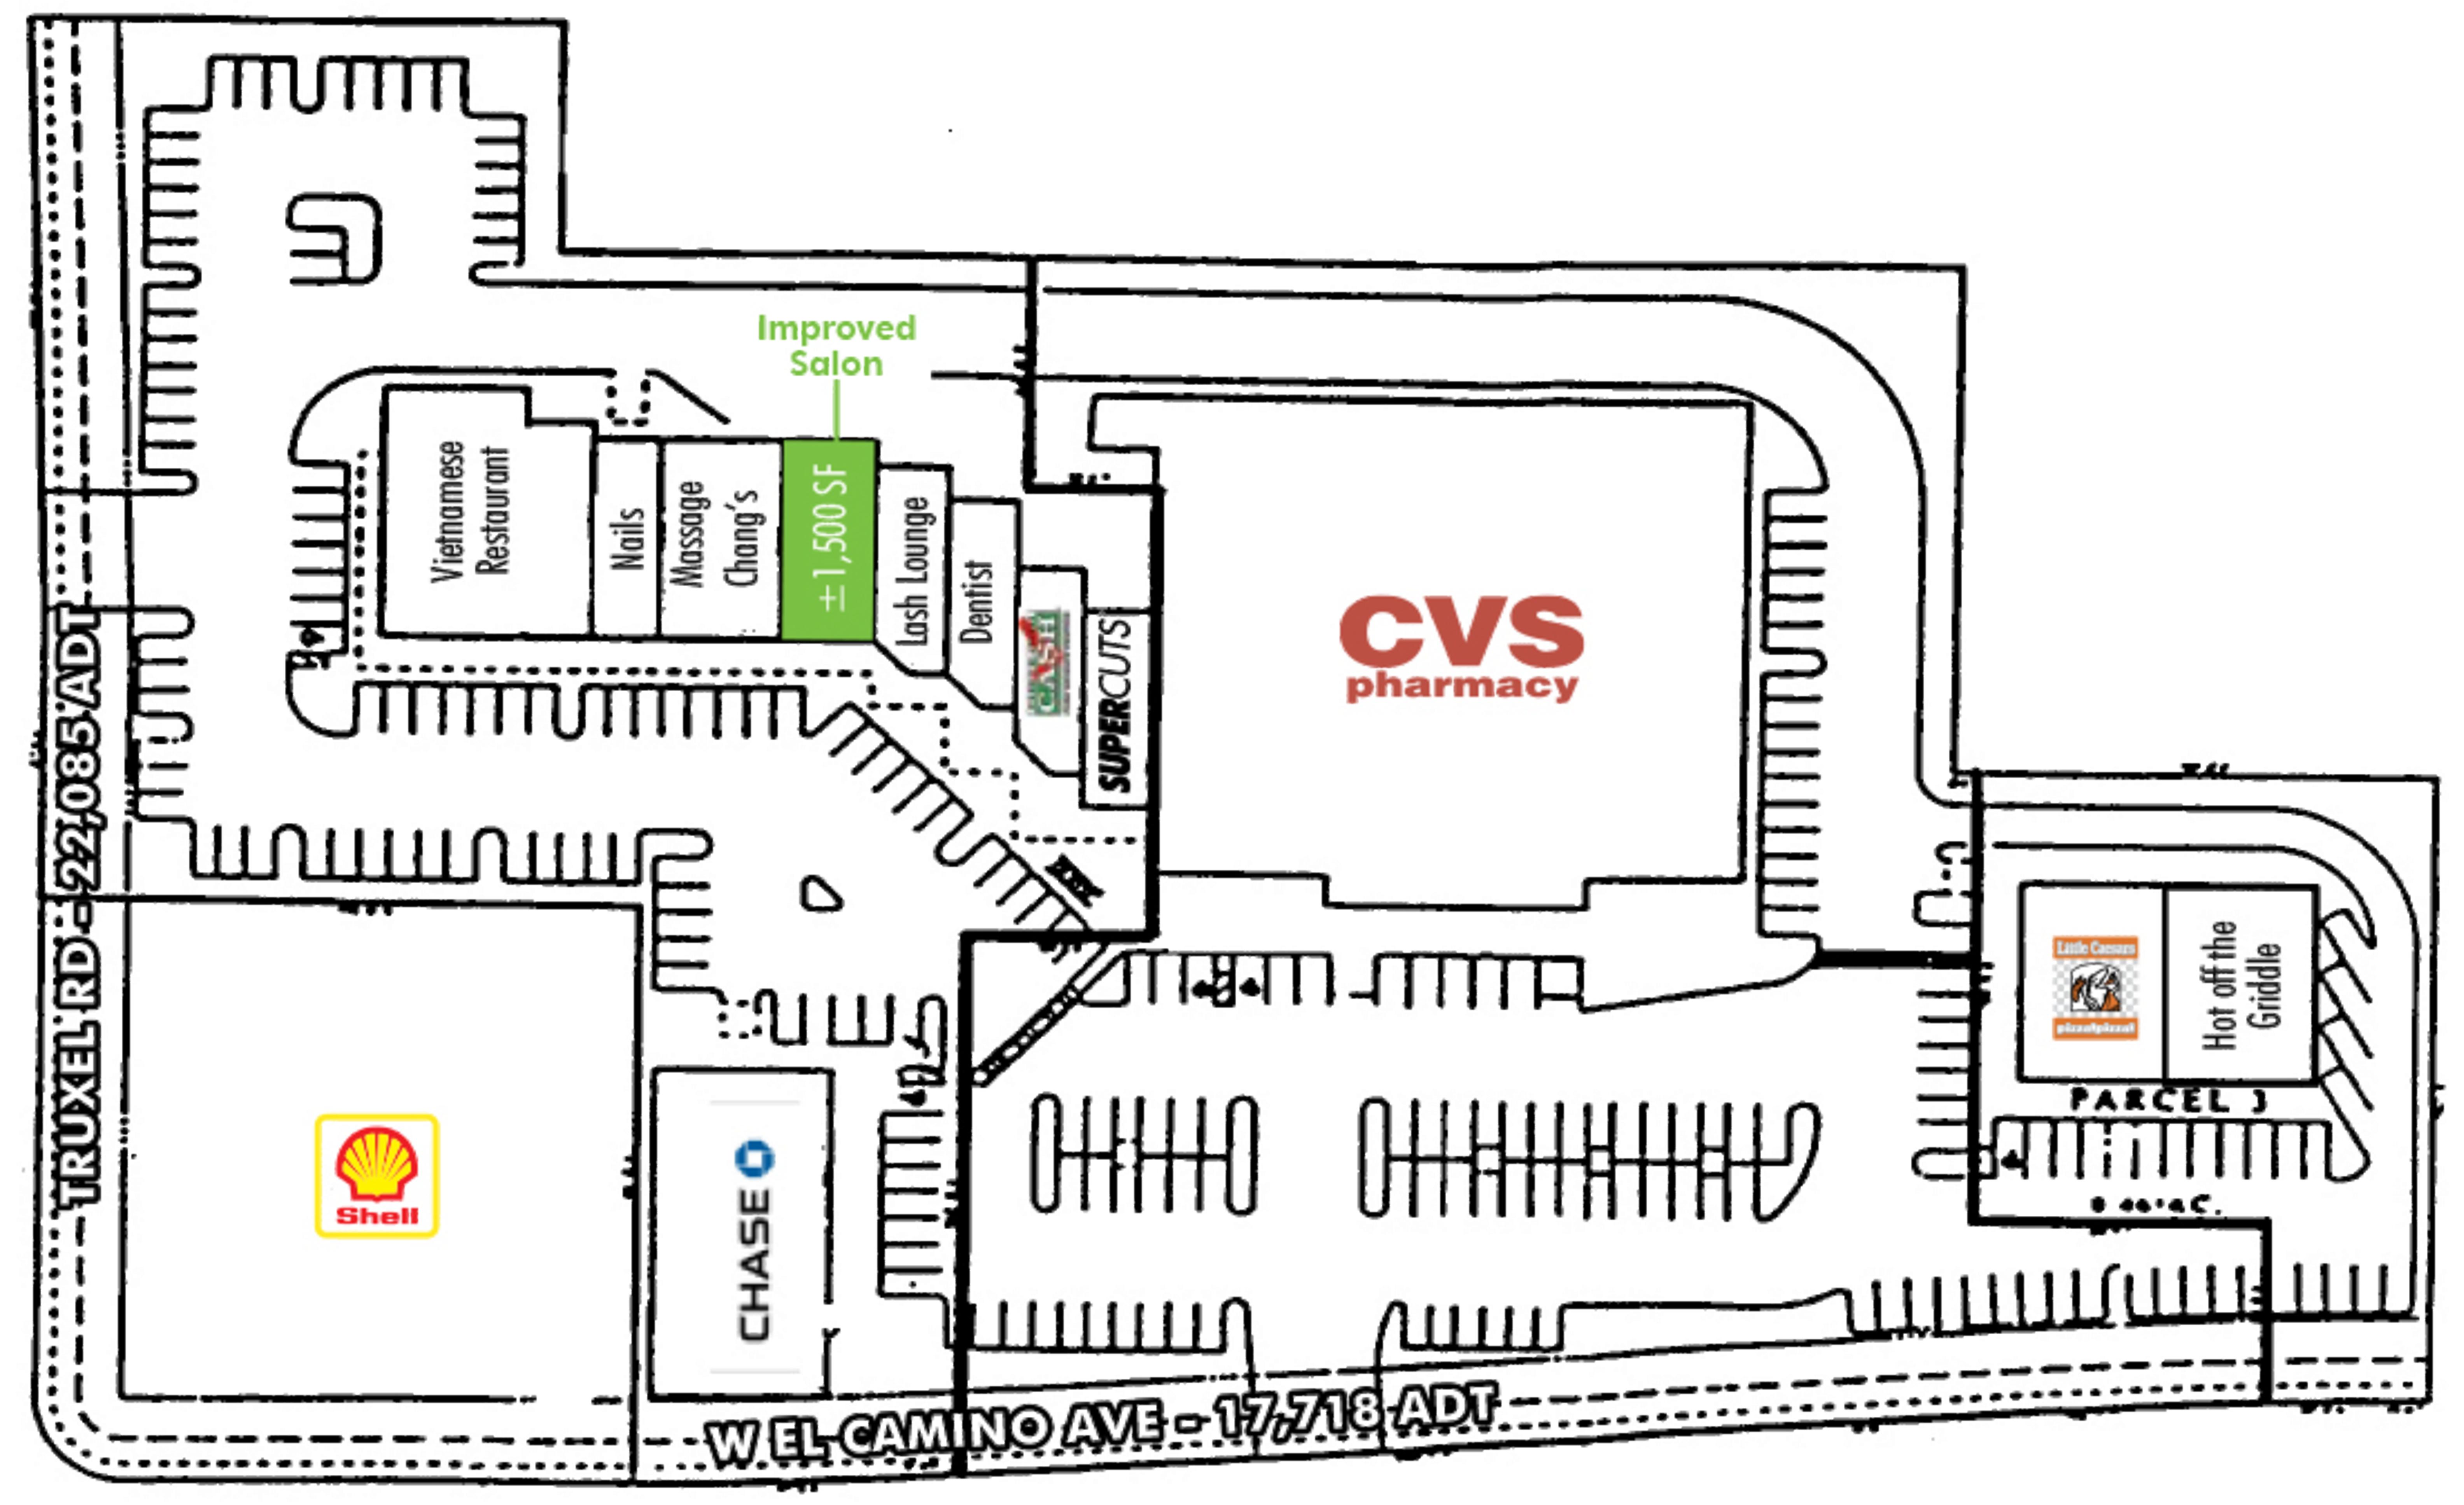 Stone Creek Center: site plan